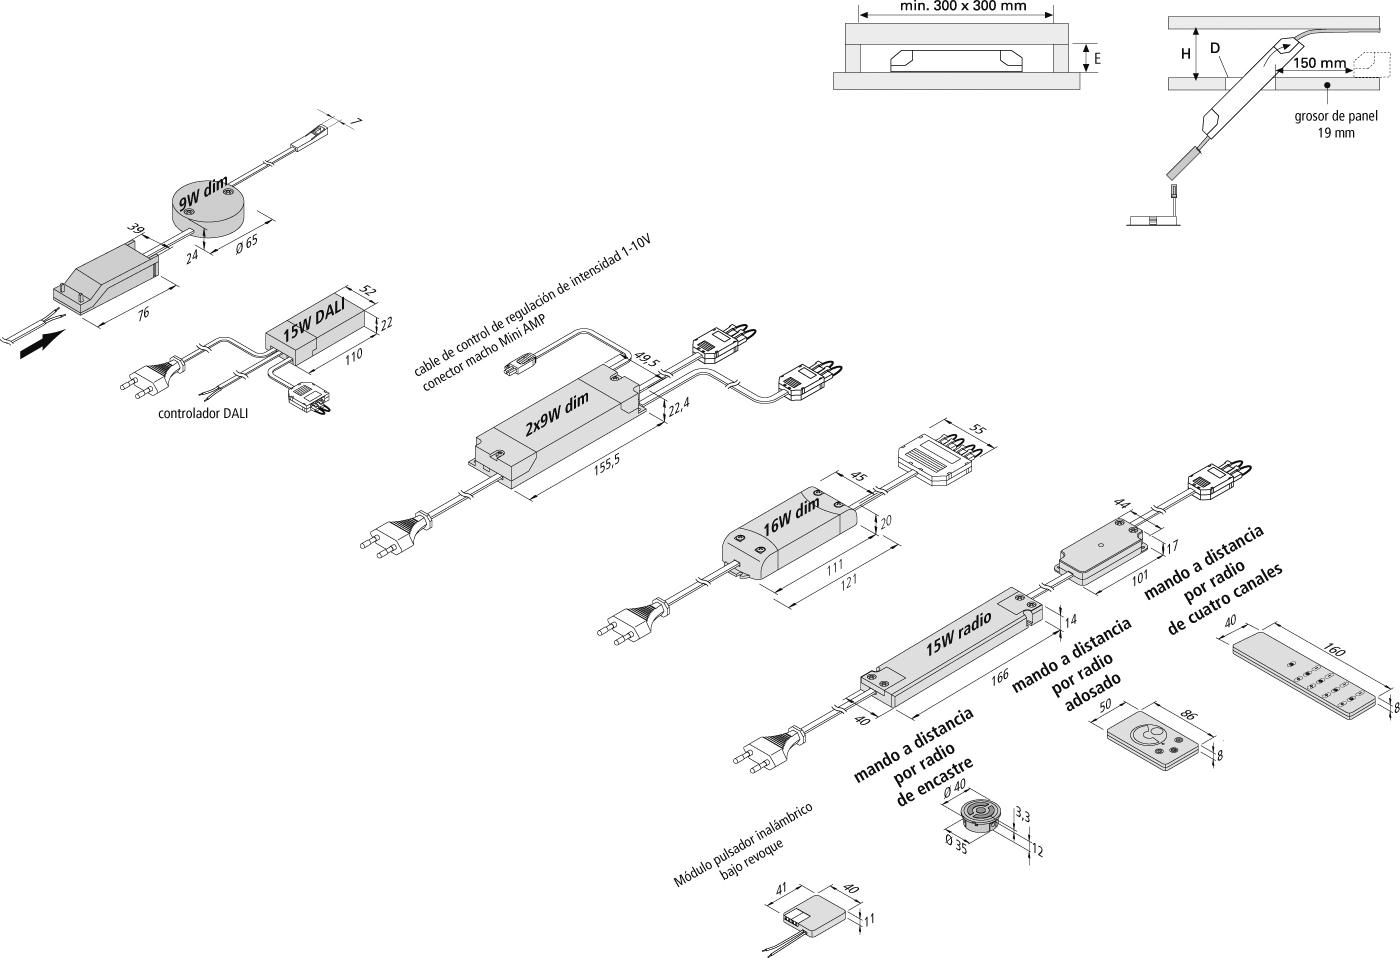 Vista preliminar: LED350_Trafokombination-Dimm_es